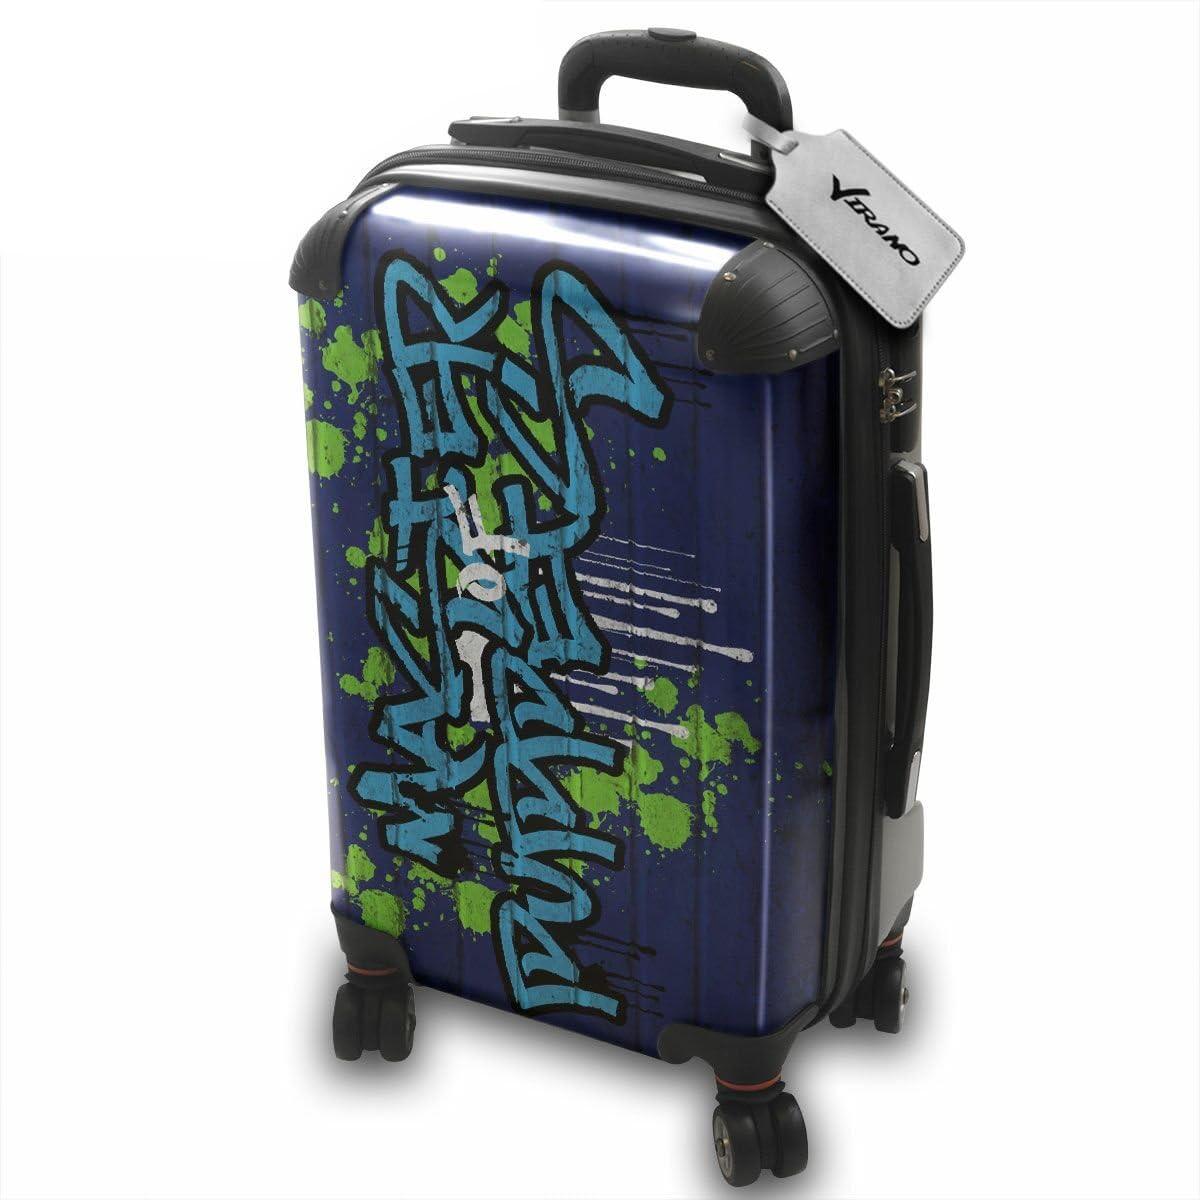 Grafiti 10036, Puppets Master, Policarbonato ABS Spinner Trolley Luggage Maleta Rigida Equipaje con 4 Ruedas de 360° con Motivo Intercambiables. Color Plateado. Pequeño S Maleta Cabin.